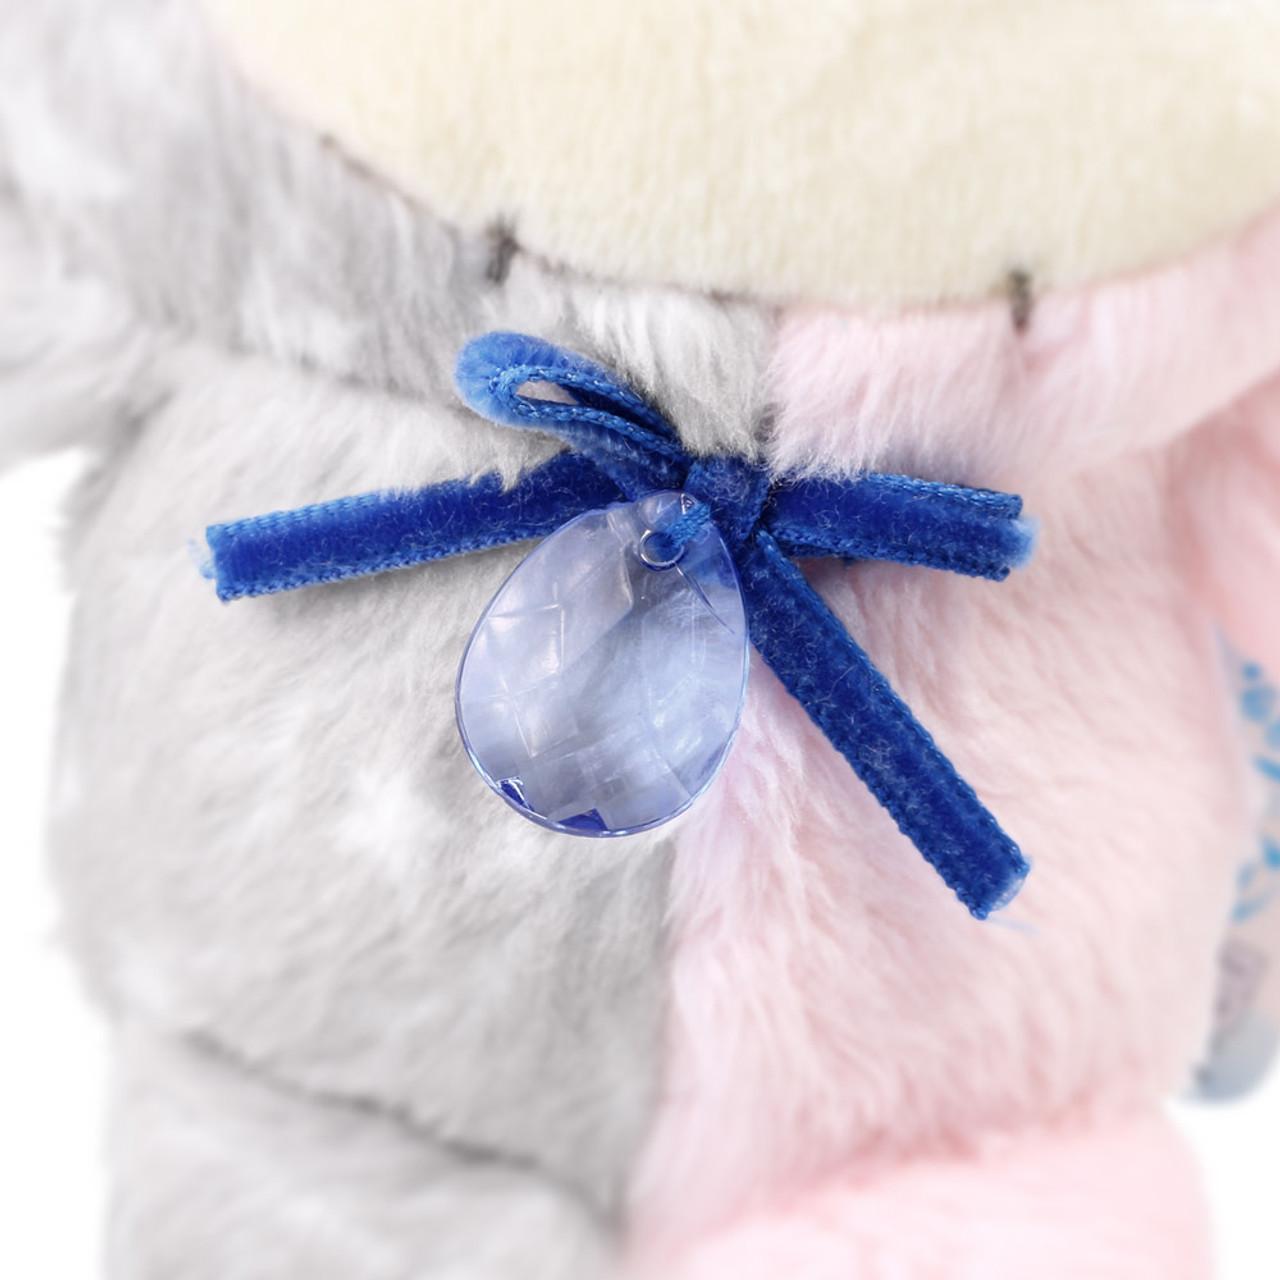 Sentimental Circus Spica Plush Doll Charms - Blue Bird ( Close-up )